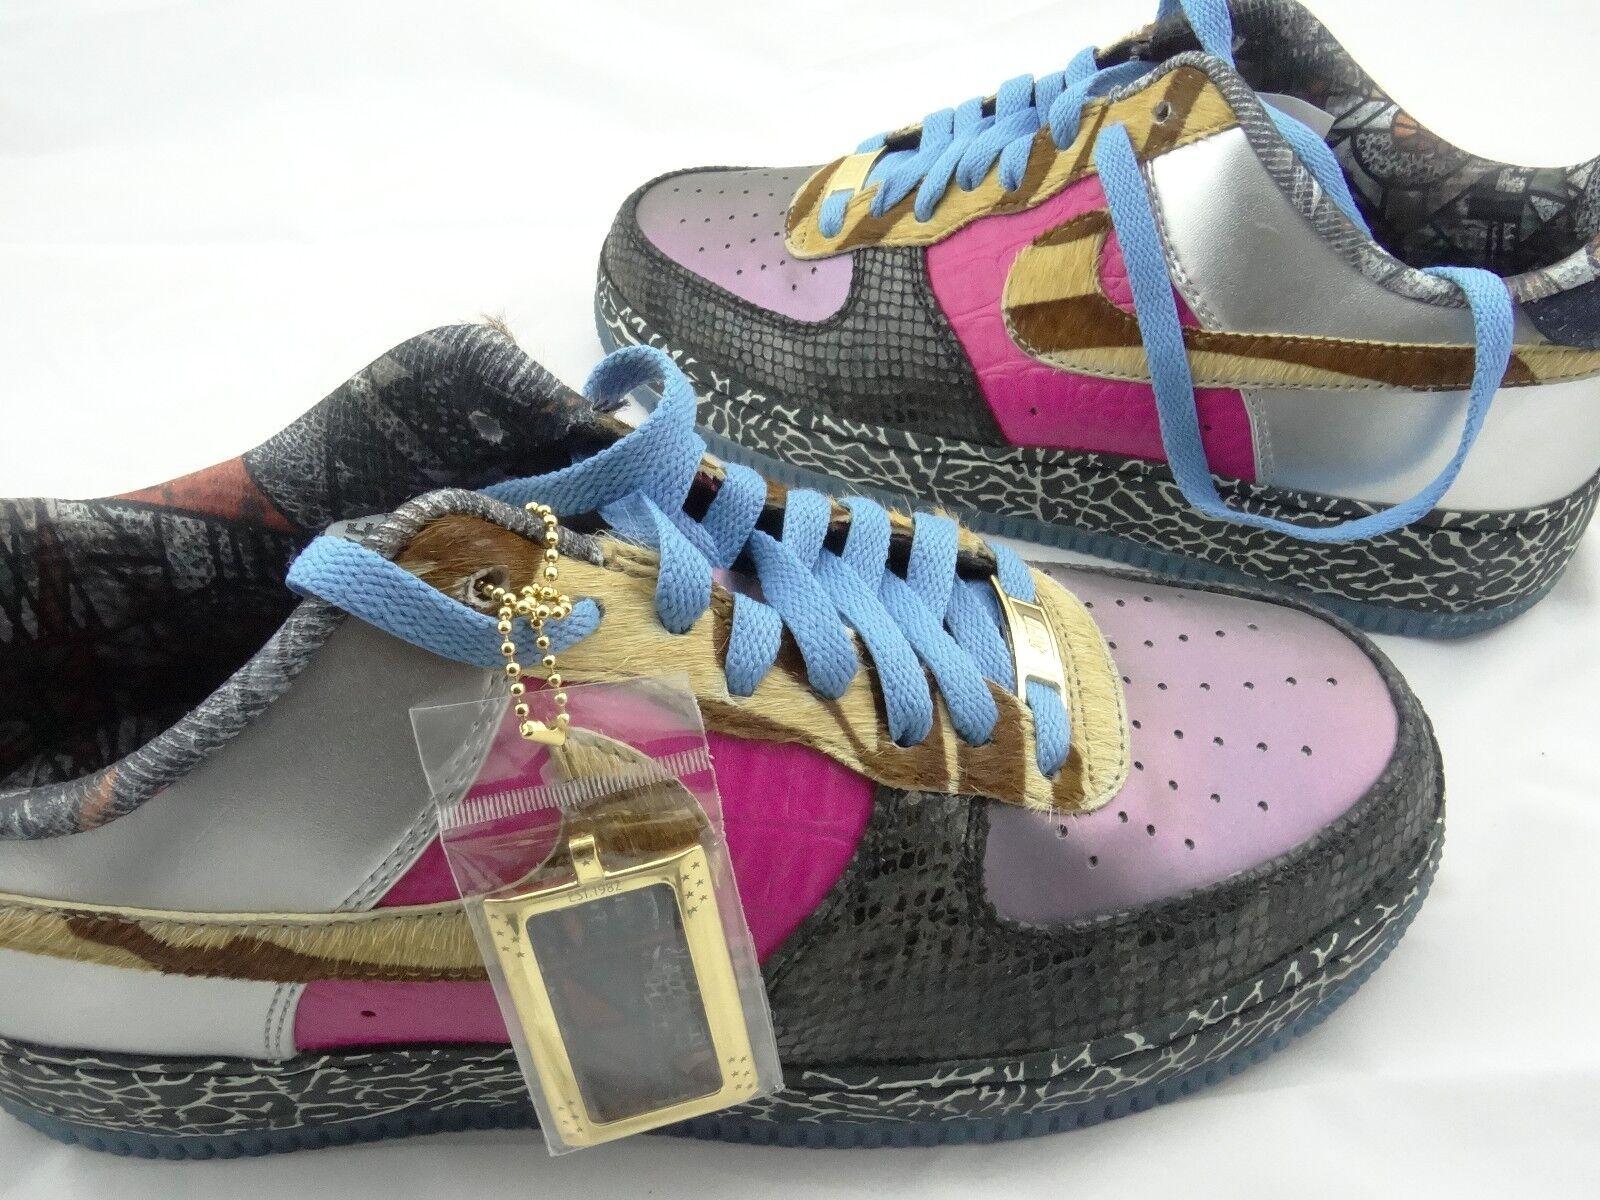 Nike AIR FORCE 1 LOW tisci,  [669709-991] tisci, LOW nmd, supreme, bobbito, sp, liquid 5415d5